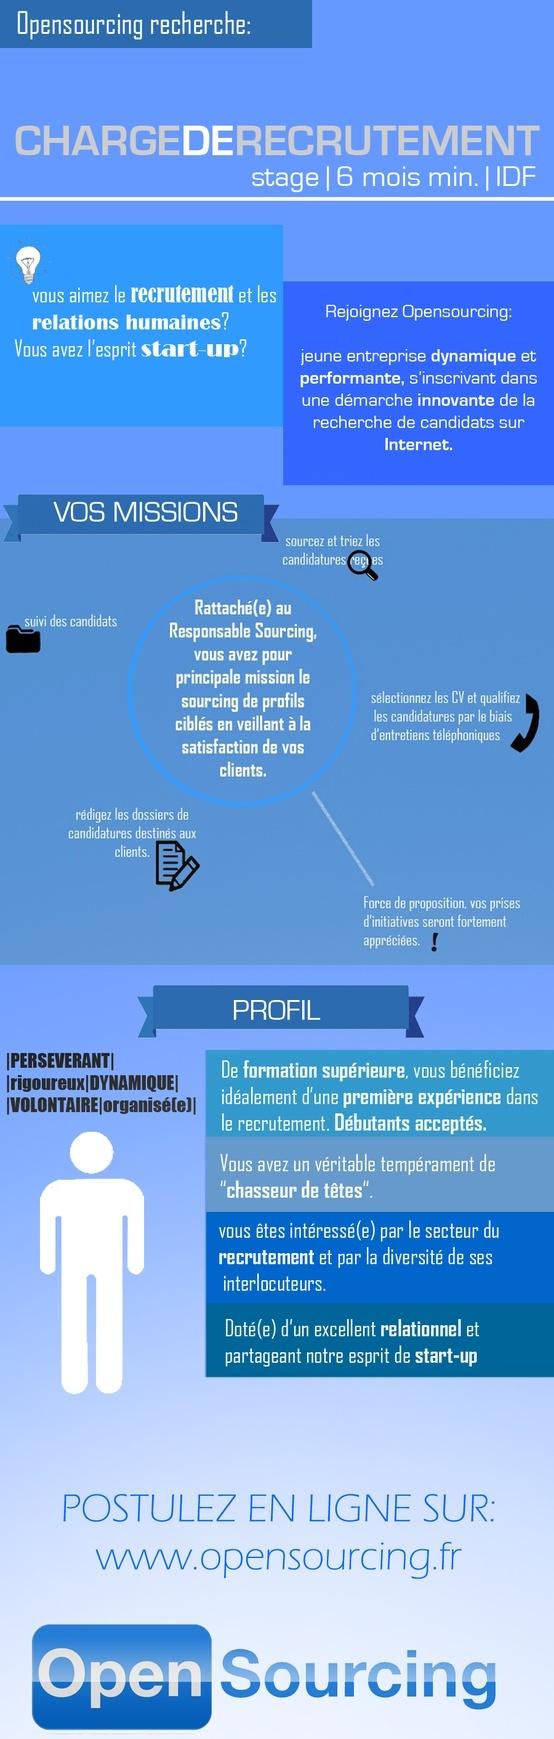 infographiste job lyon